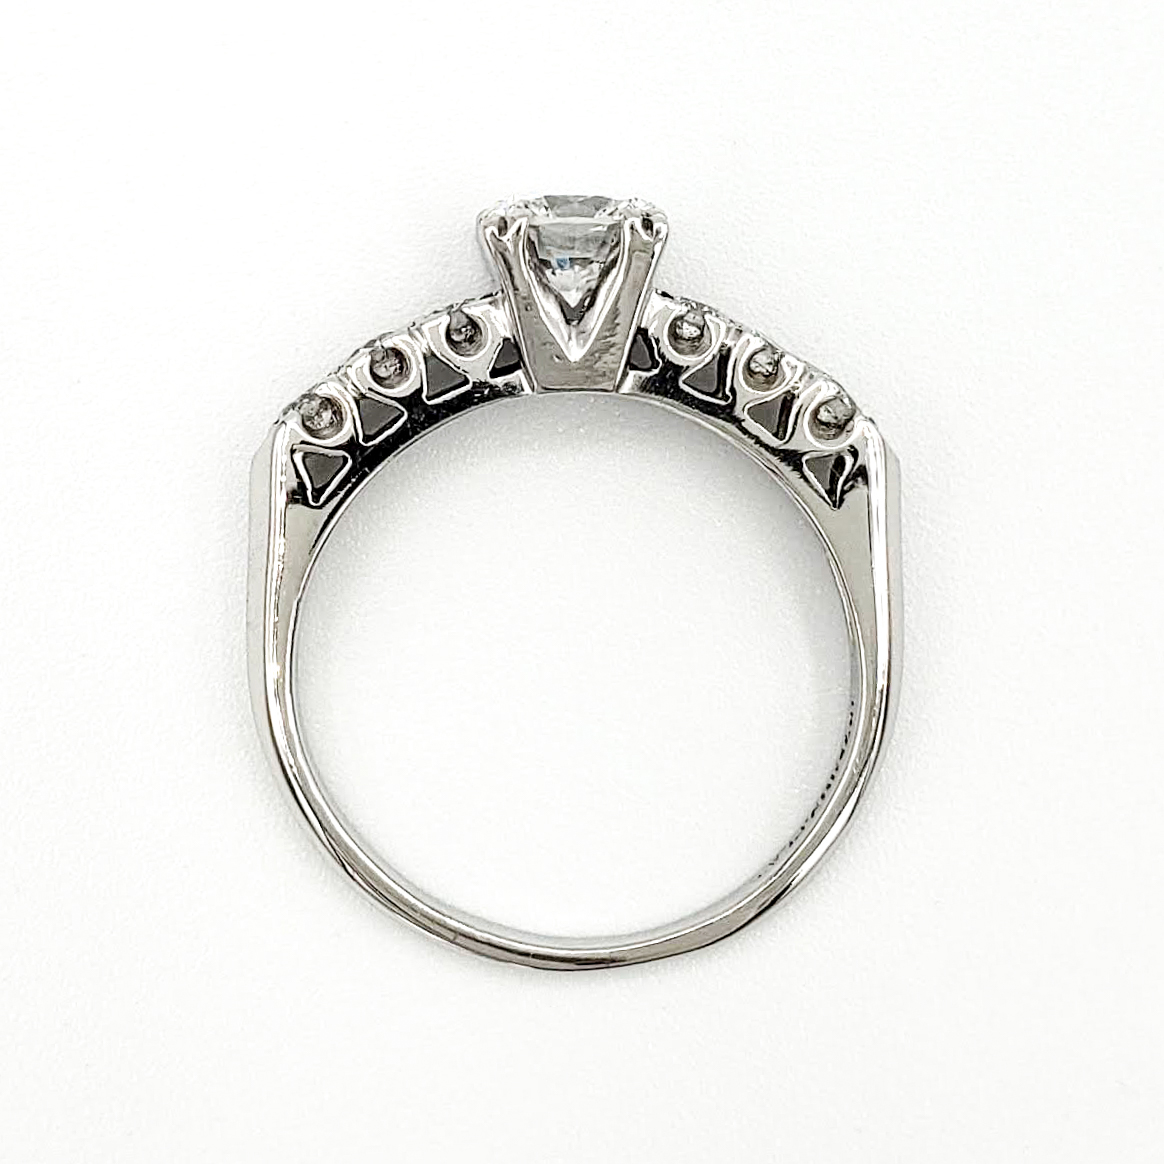 vintage-platinum-engagement-ring-with-0-66-carat-round-brilliant-cut-diamond-egl-d-si1